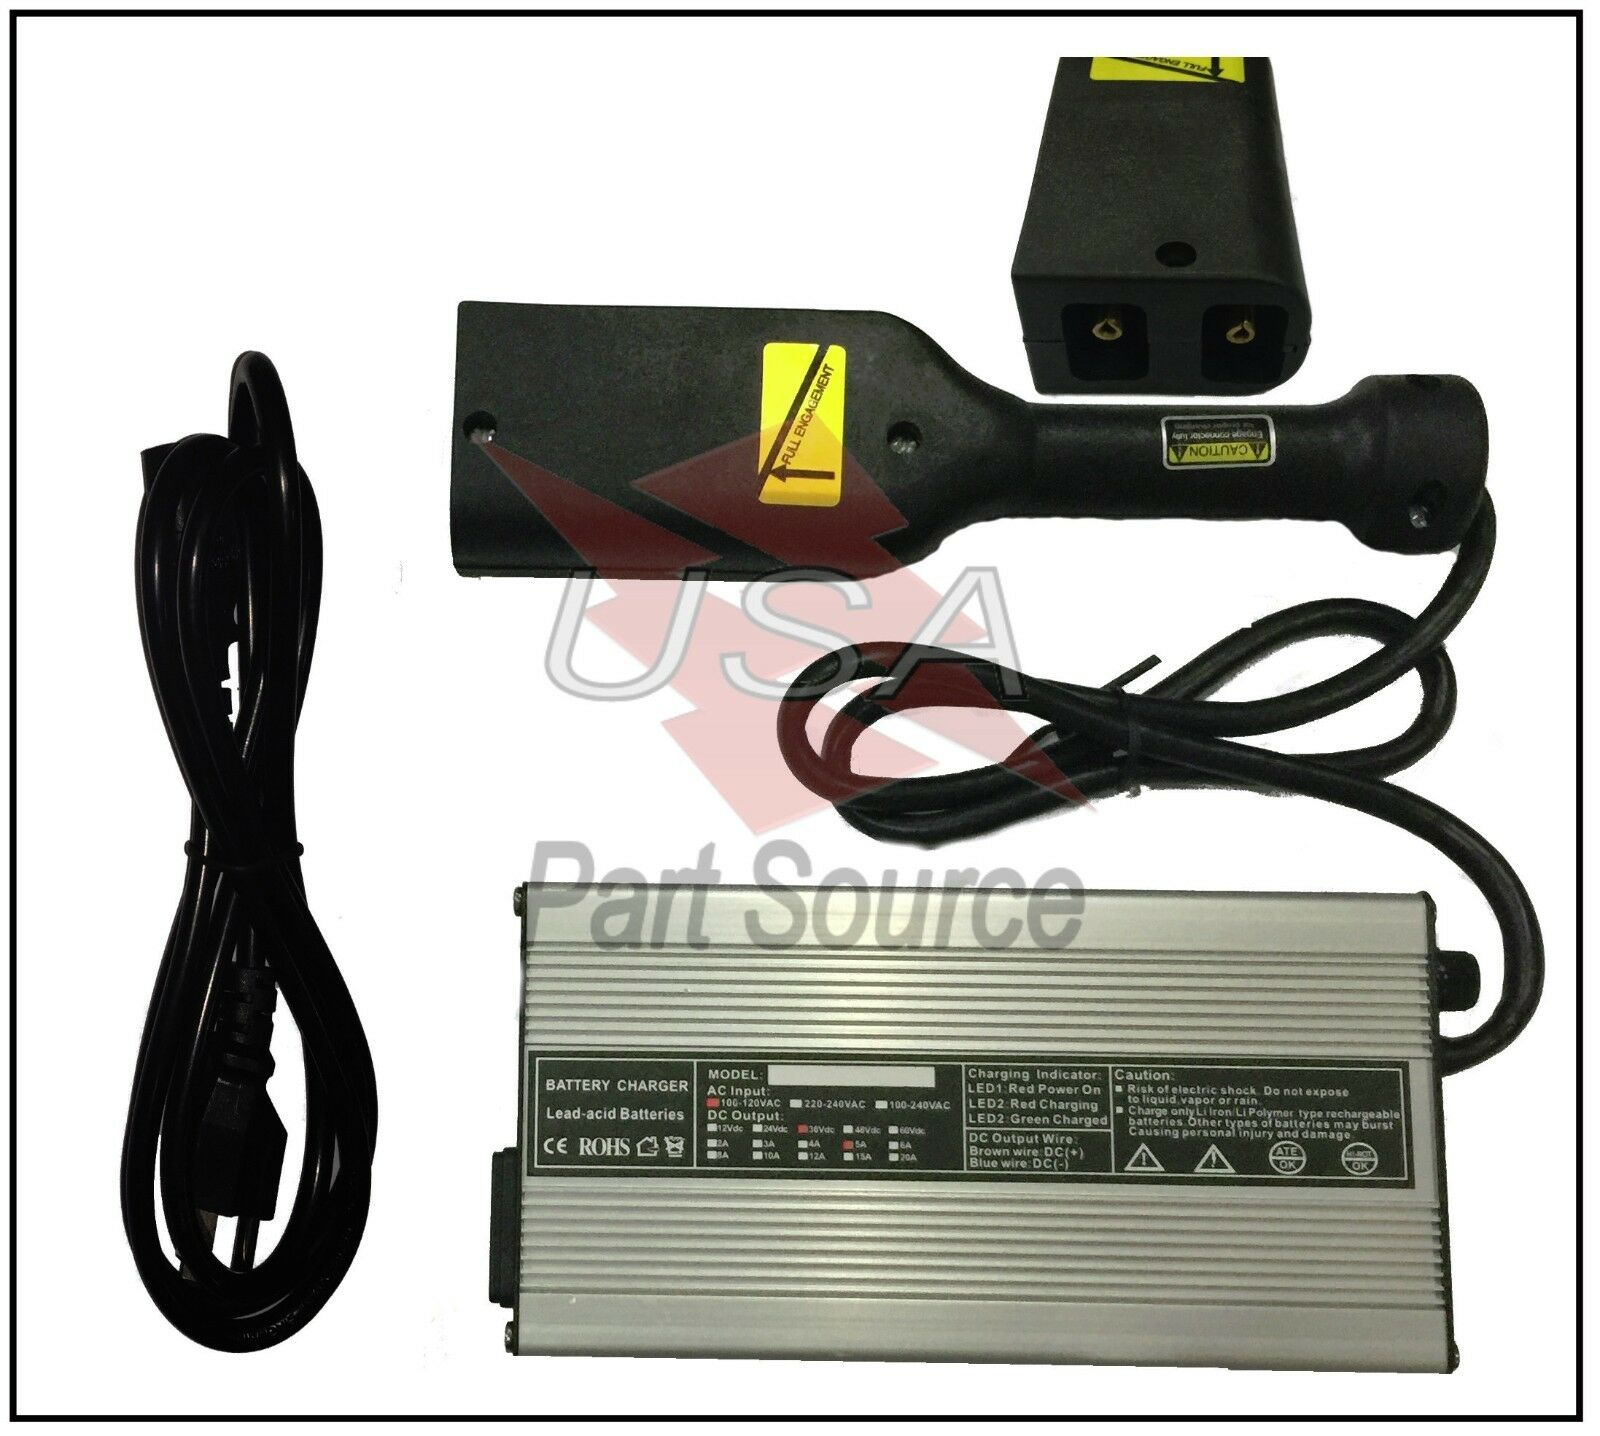 club car 36v batteries diagram 2001 pt cruiser speaker wiring 36 volt battery charger golf cart for ez go